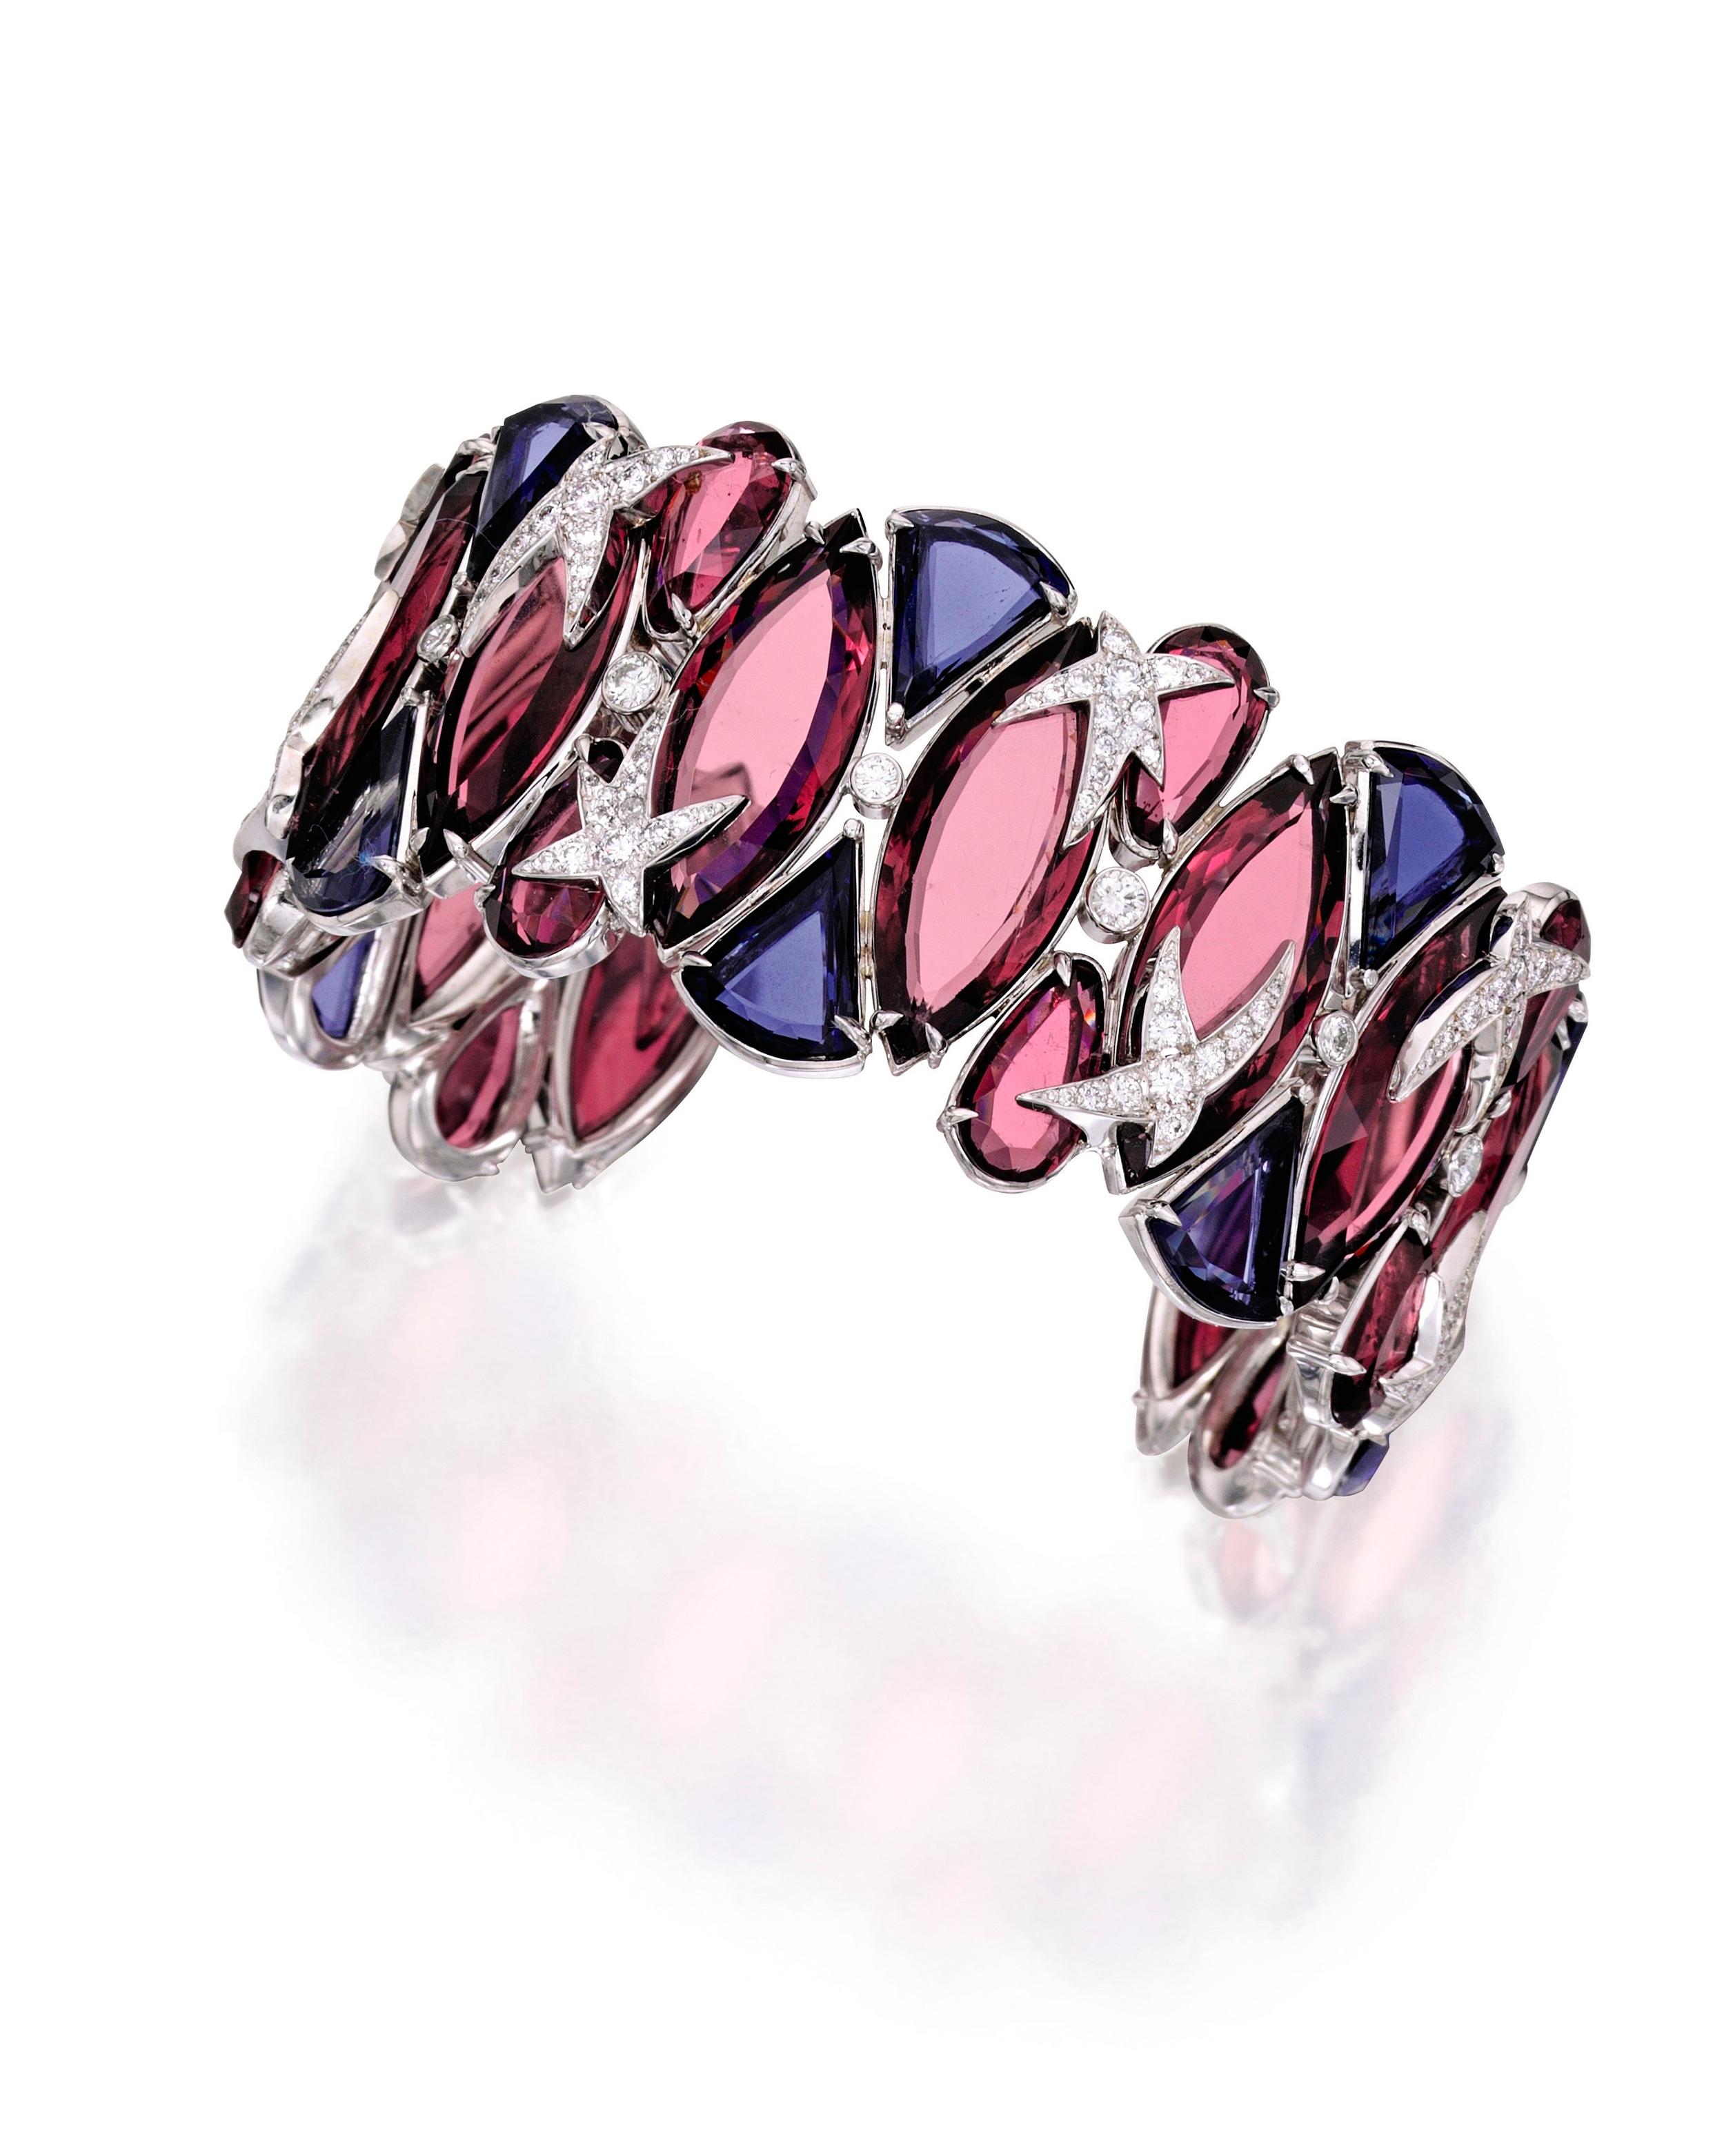 sothebys-ebay-auction-9331-lot-174-0415.jpg